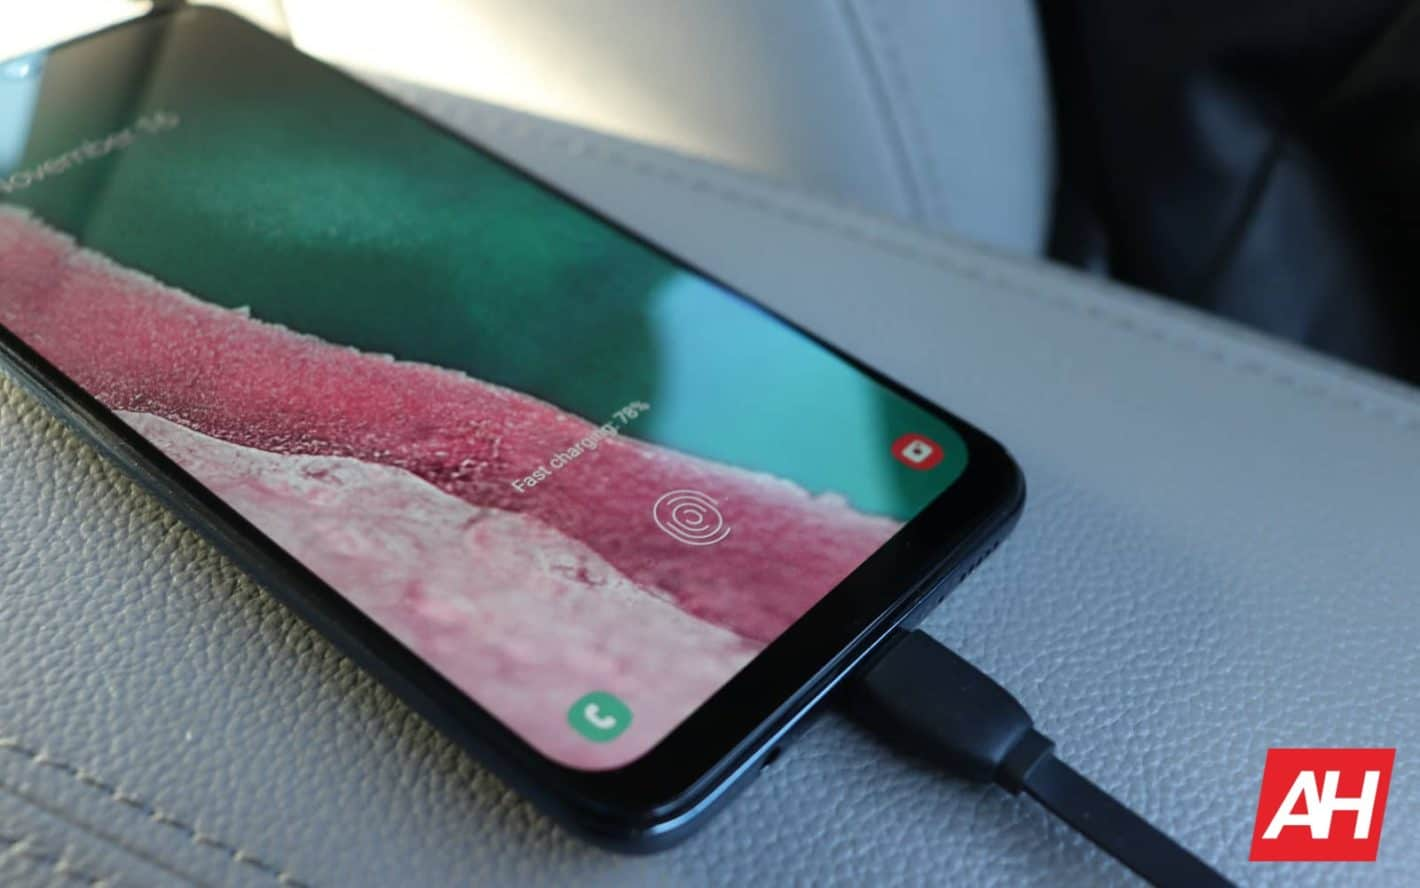 Samsung Galaxy A50 Review 08 battery AH 2019